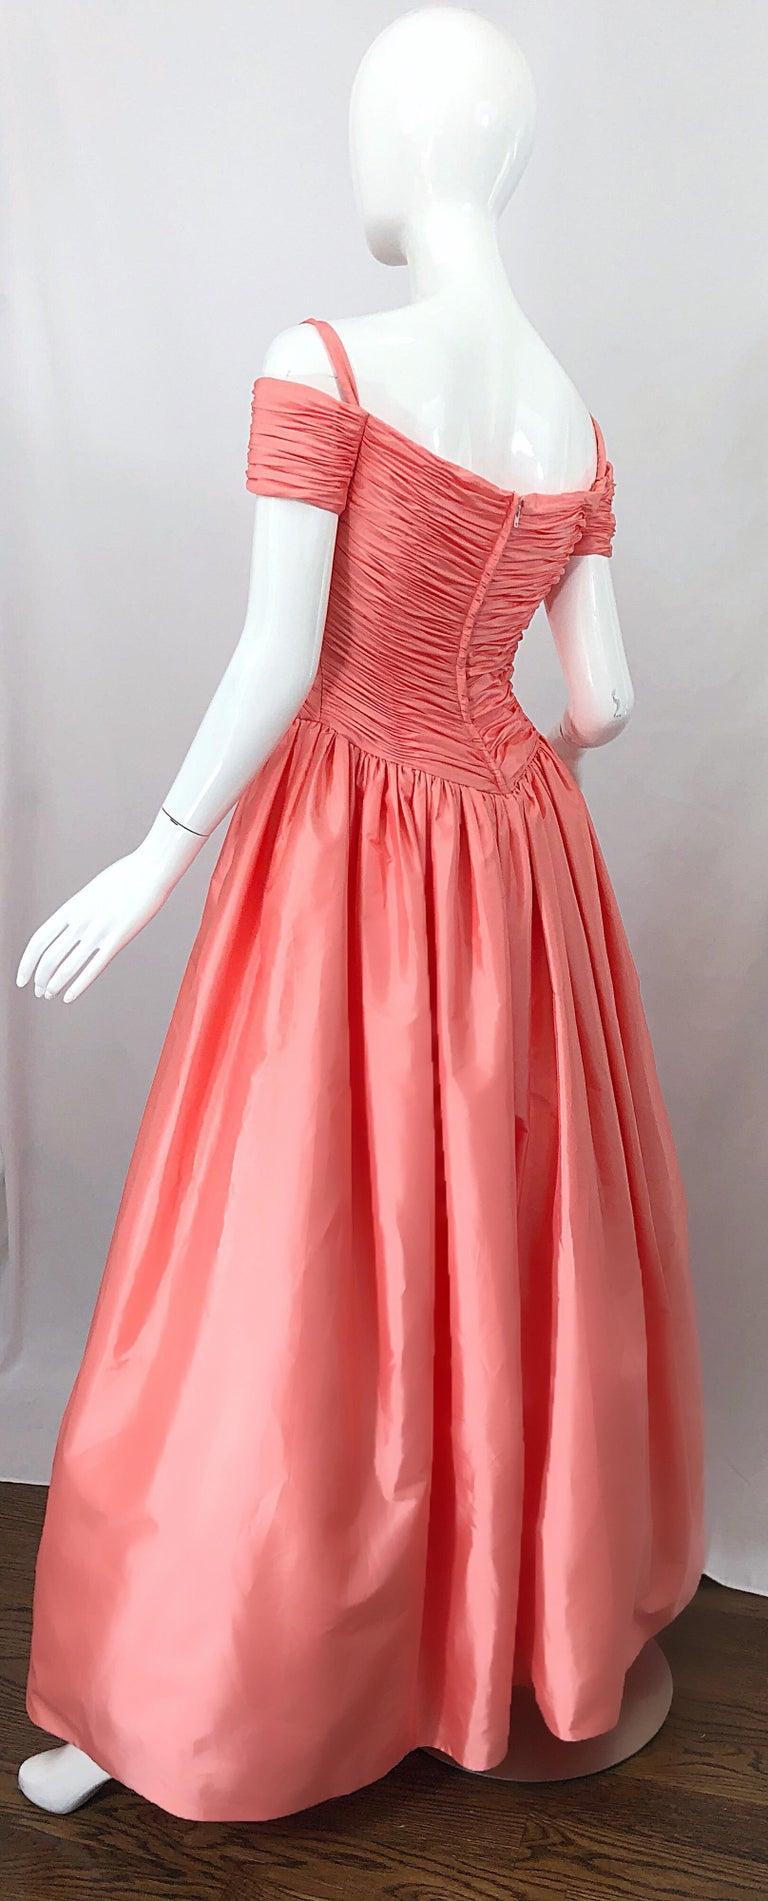 1980s Chris Kole Coral Pink Size 6 Off the Shoulder Silk Taffeta Vintage Gown For Sale 10